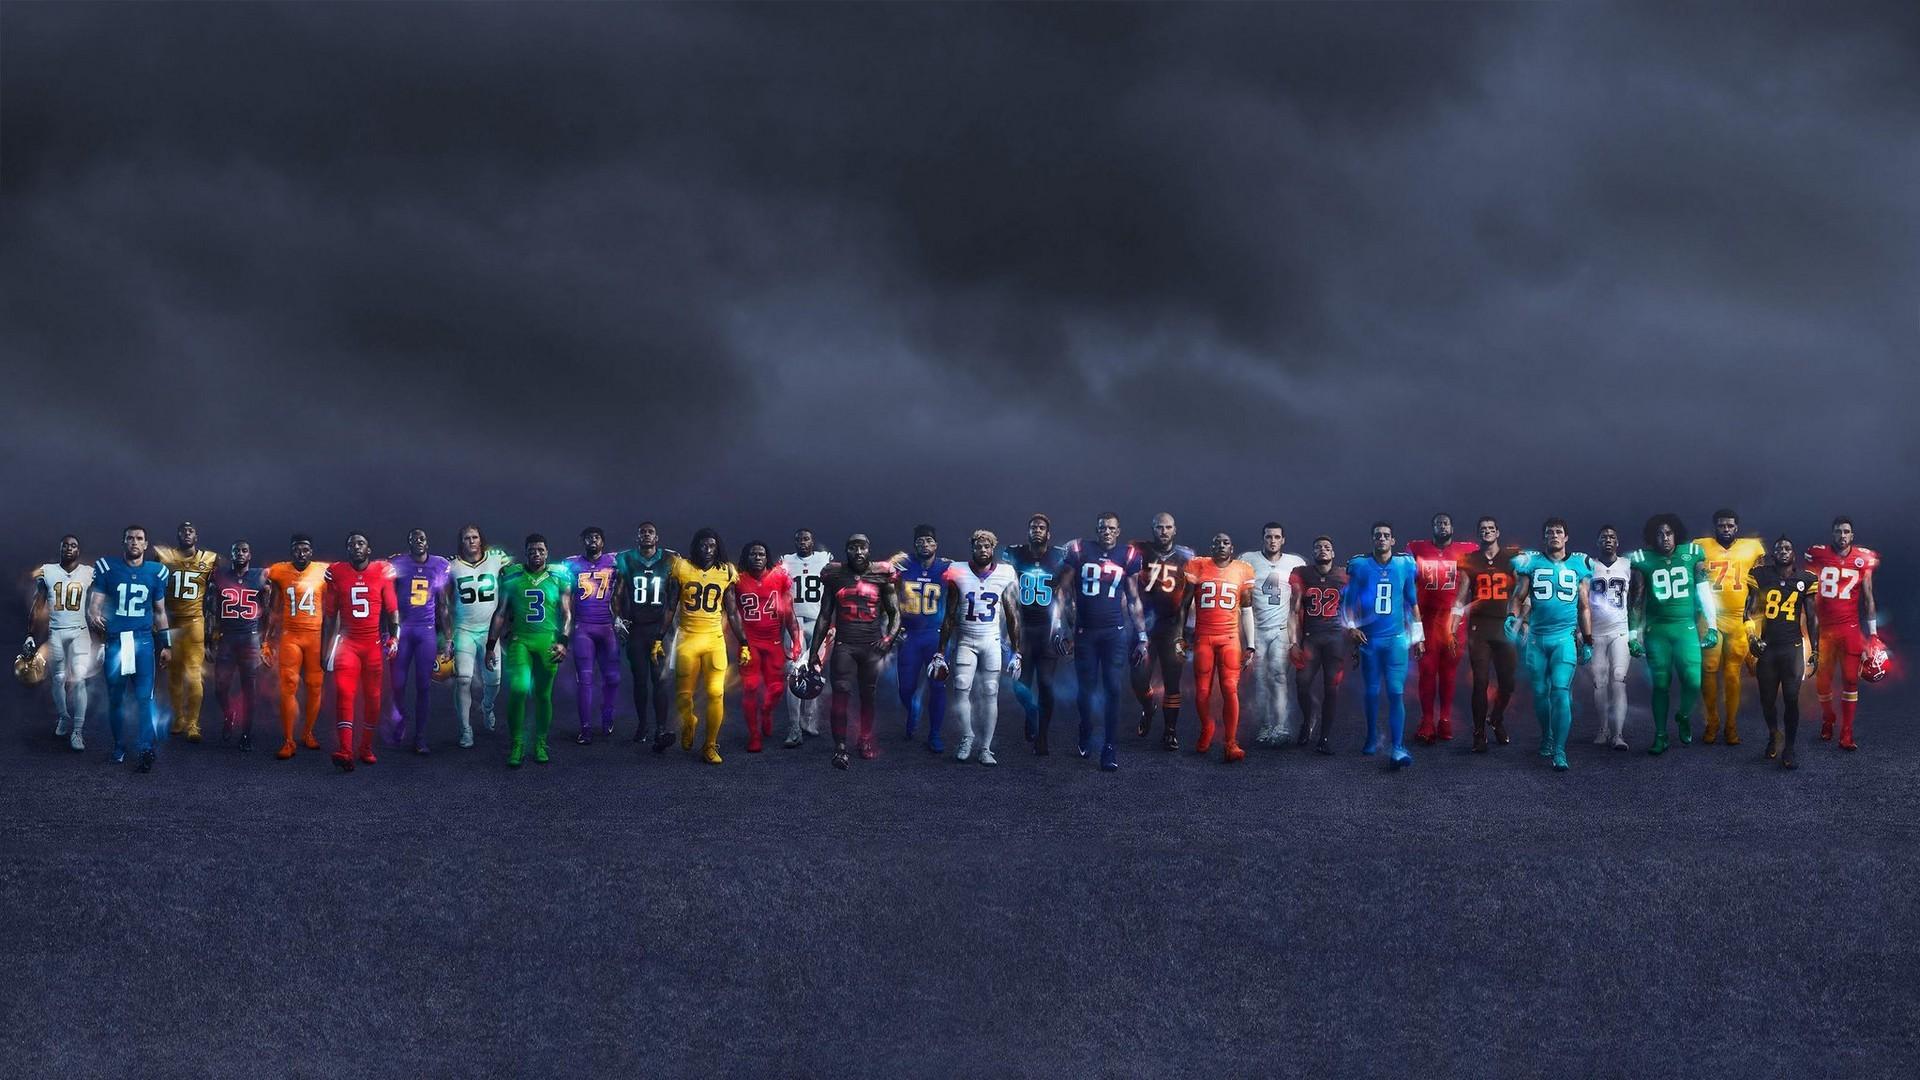 cool hd NFL Football Wallpaper